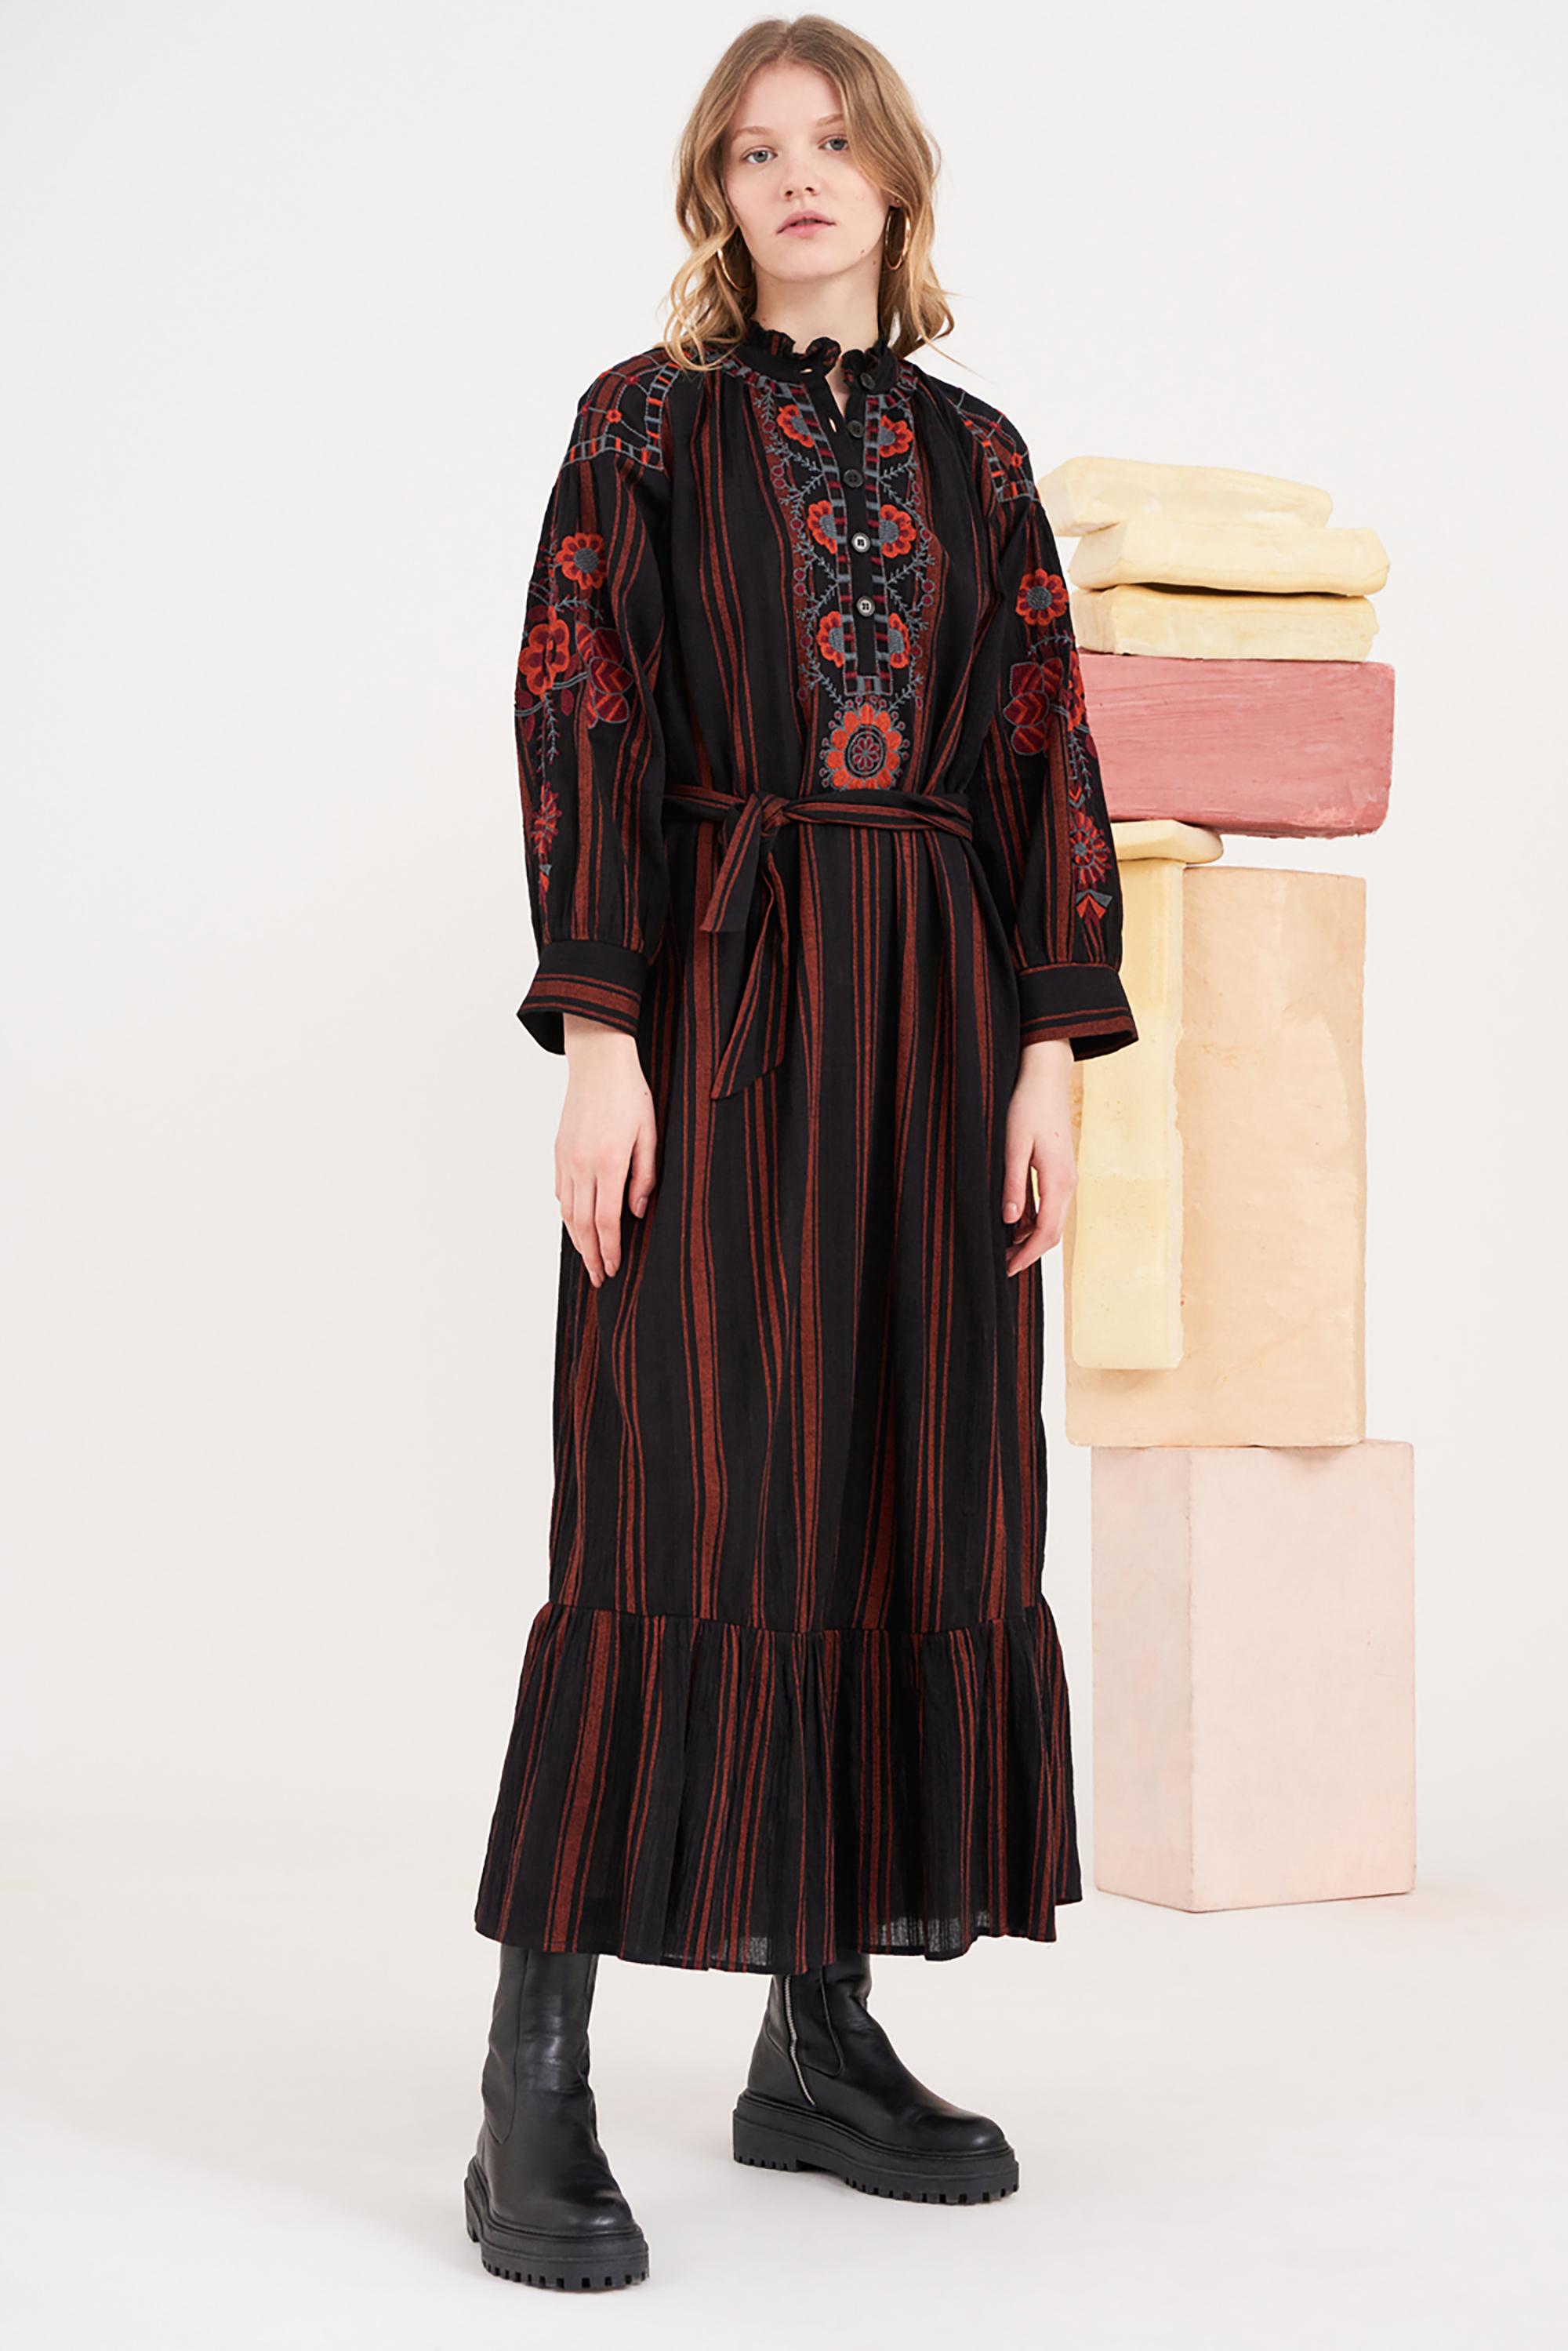 Robe longue brodée Cami - Noir - Antik Batik (photo)